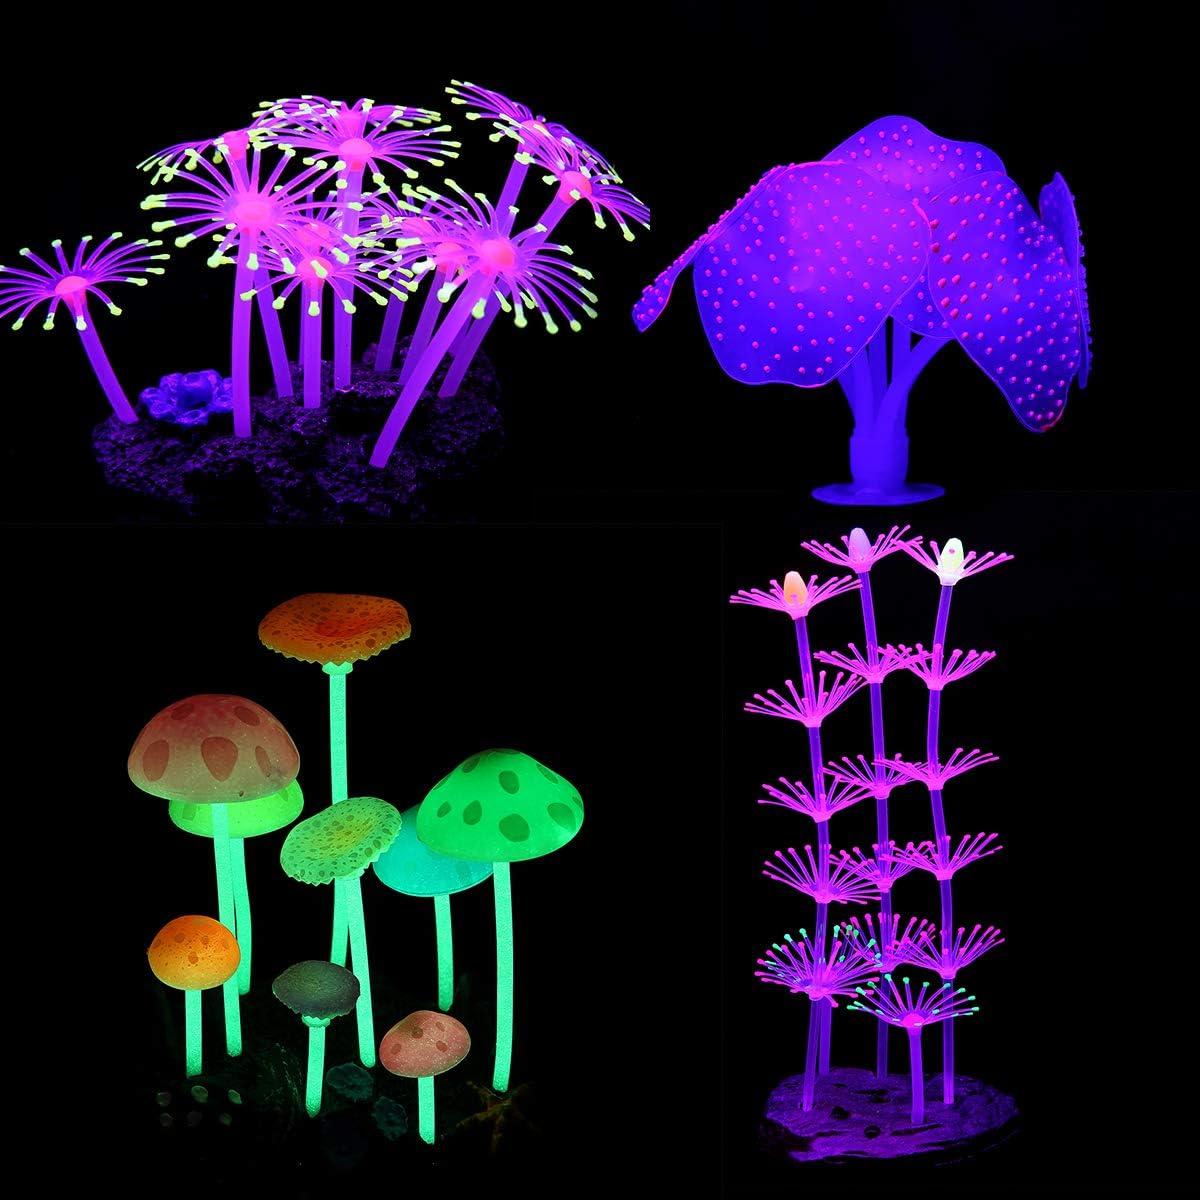 LANSEYQO Aquarium Fish Tank Decorations, Glowing Simulation Coral Mushroom Plant for Fish Tank Ornament 4 Pack